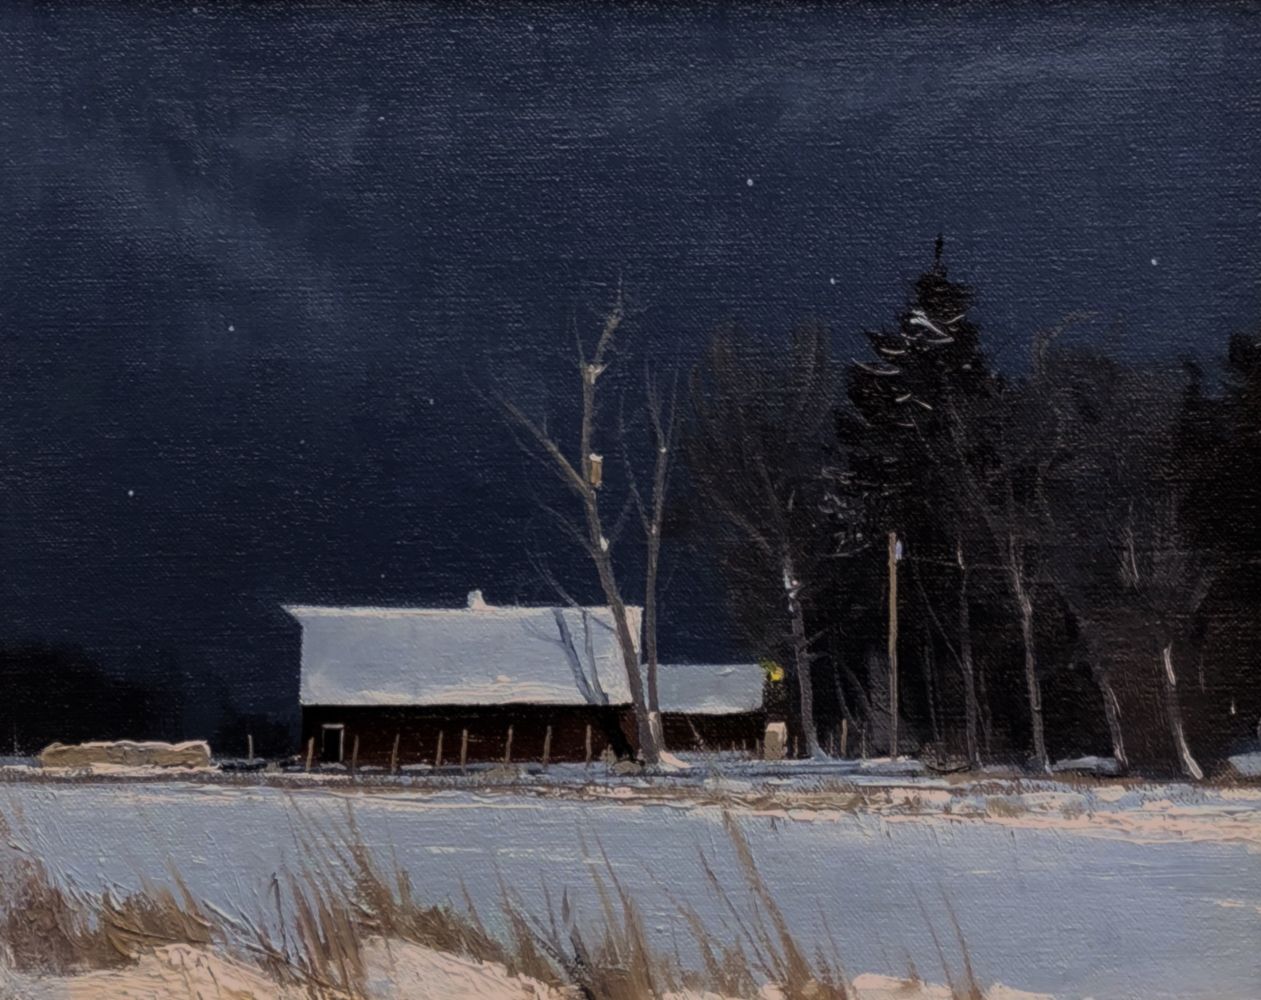 ben_bauer_bb1081_barn_and_woodduck_house_in_moonlight.jpg